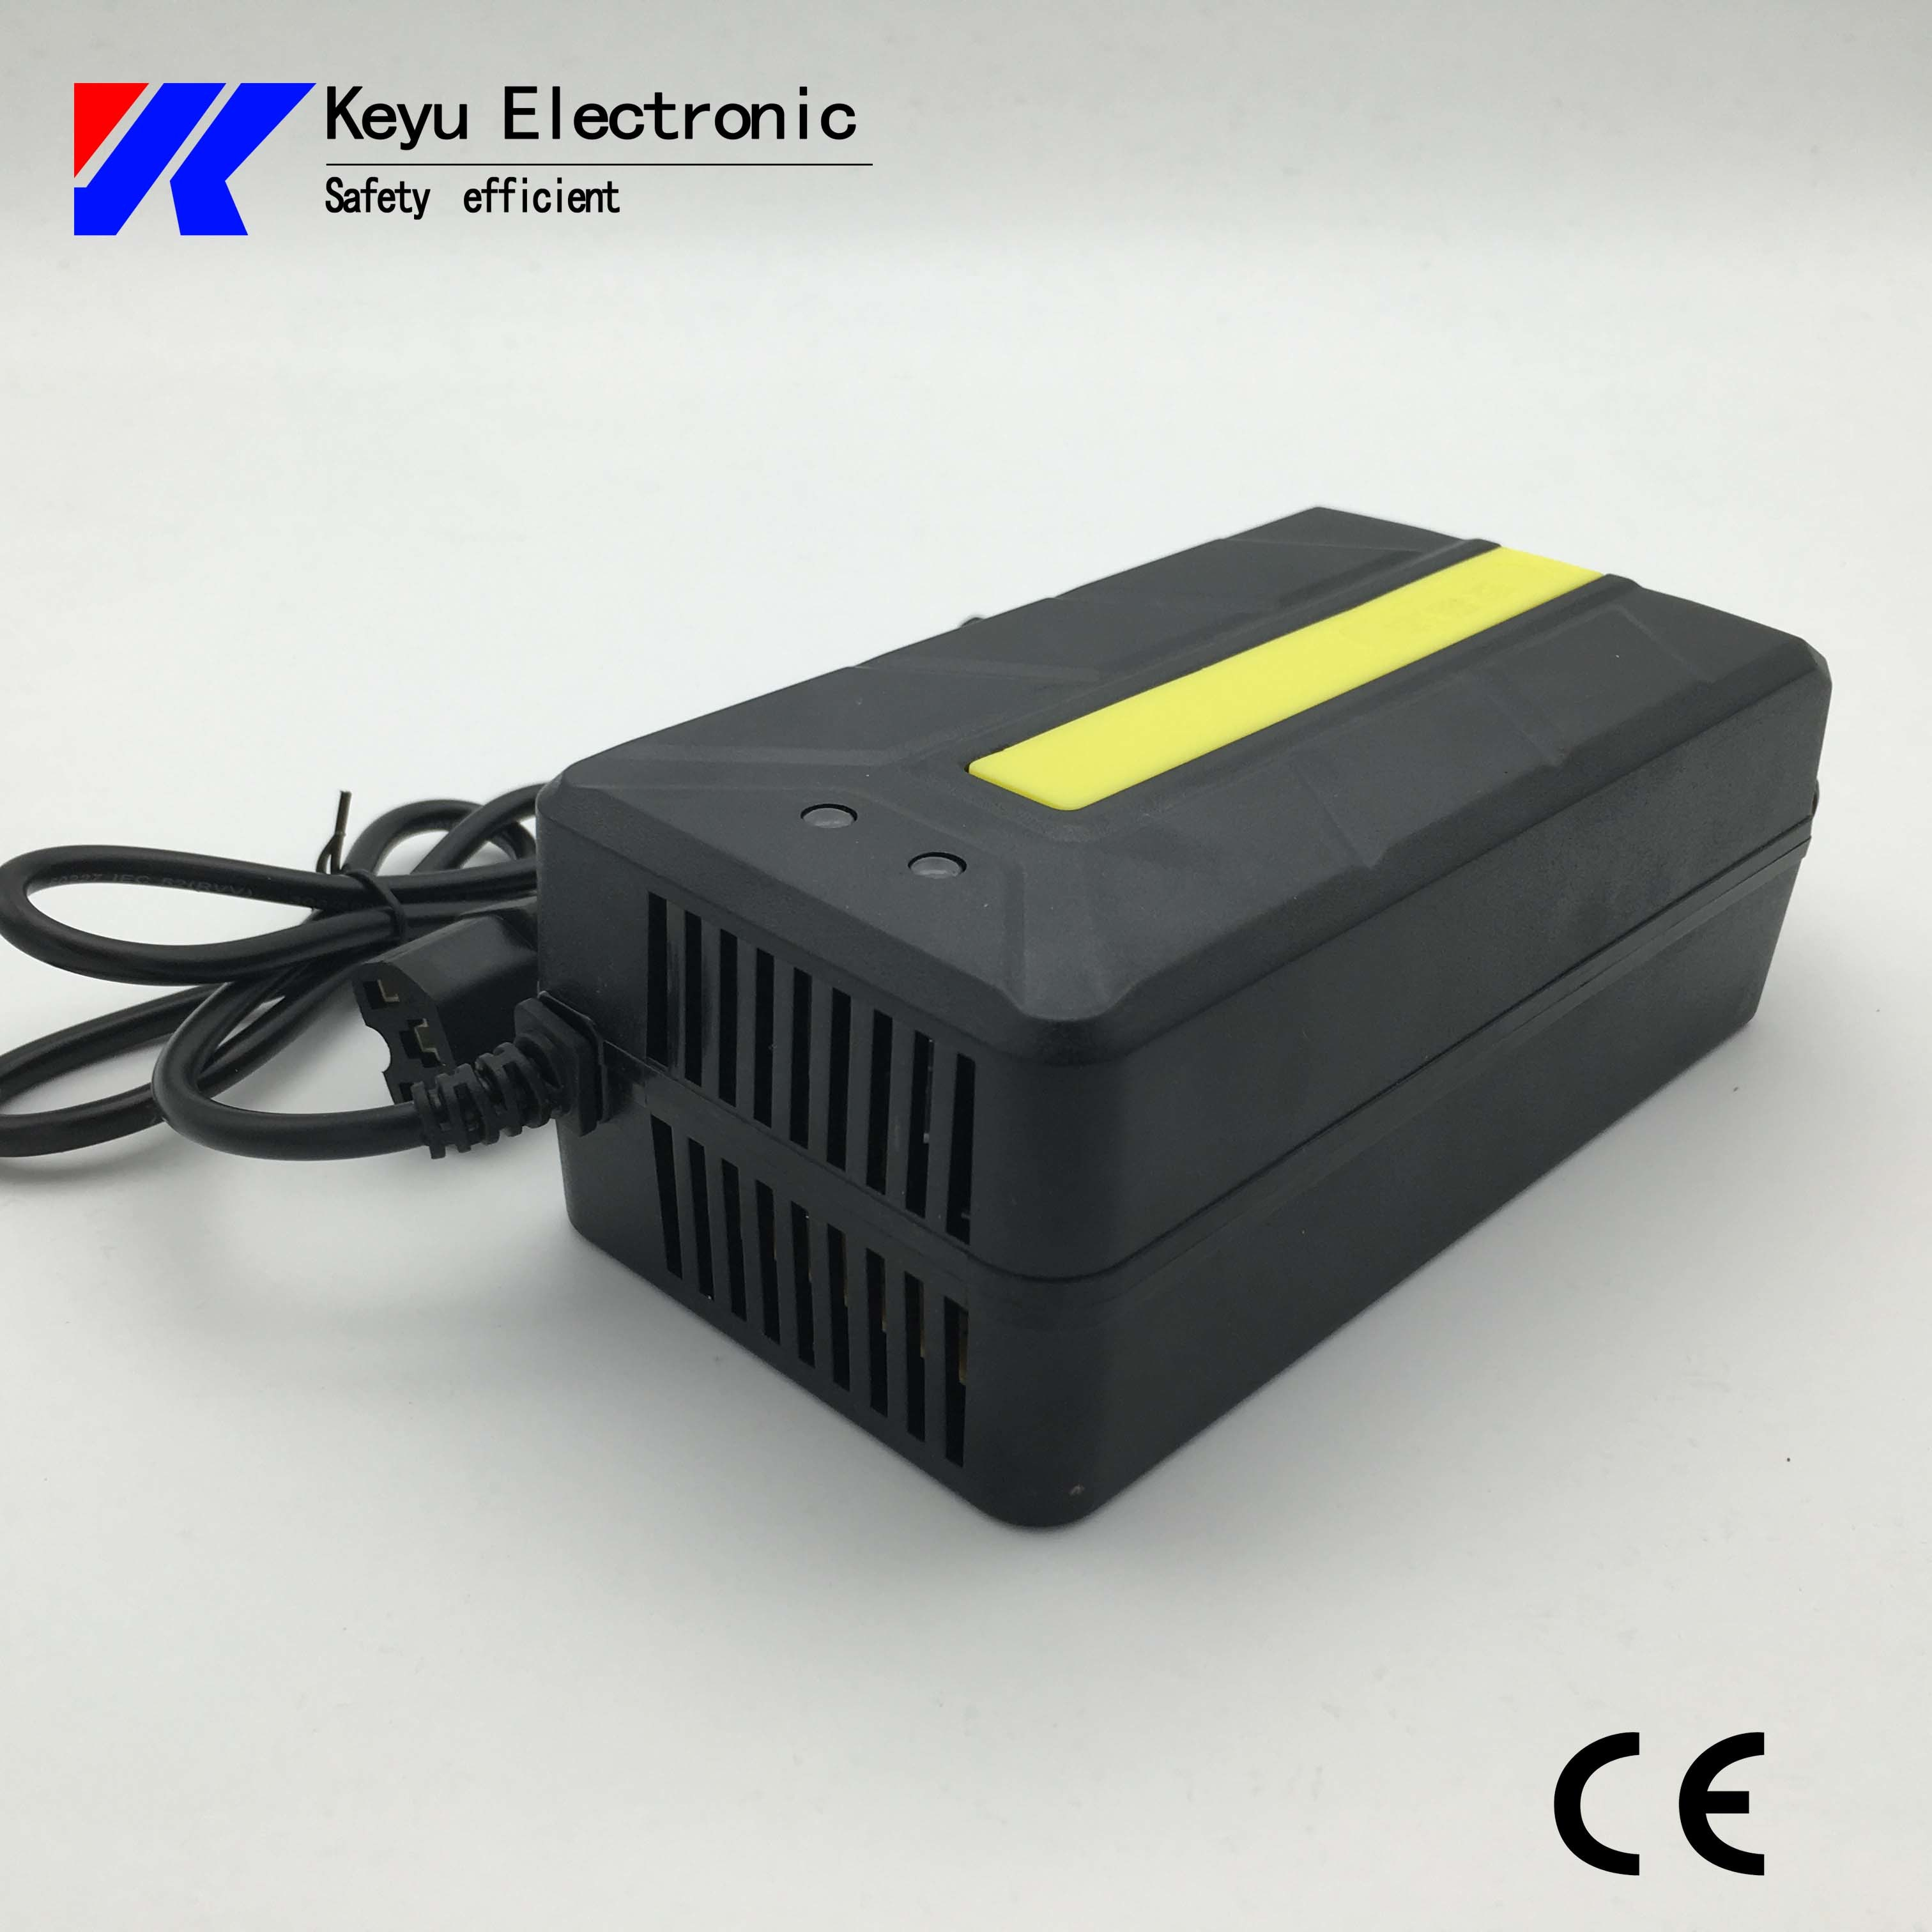 AN YI DA Ebike Charger36V-12ah (Lead Acid battery)